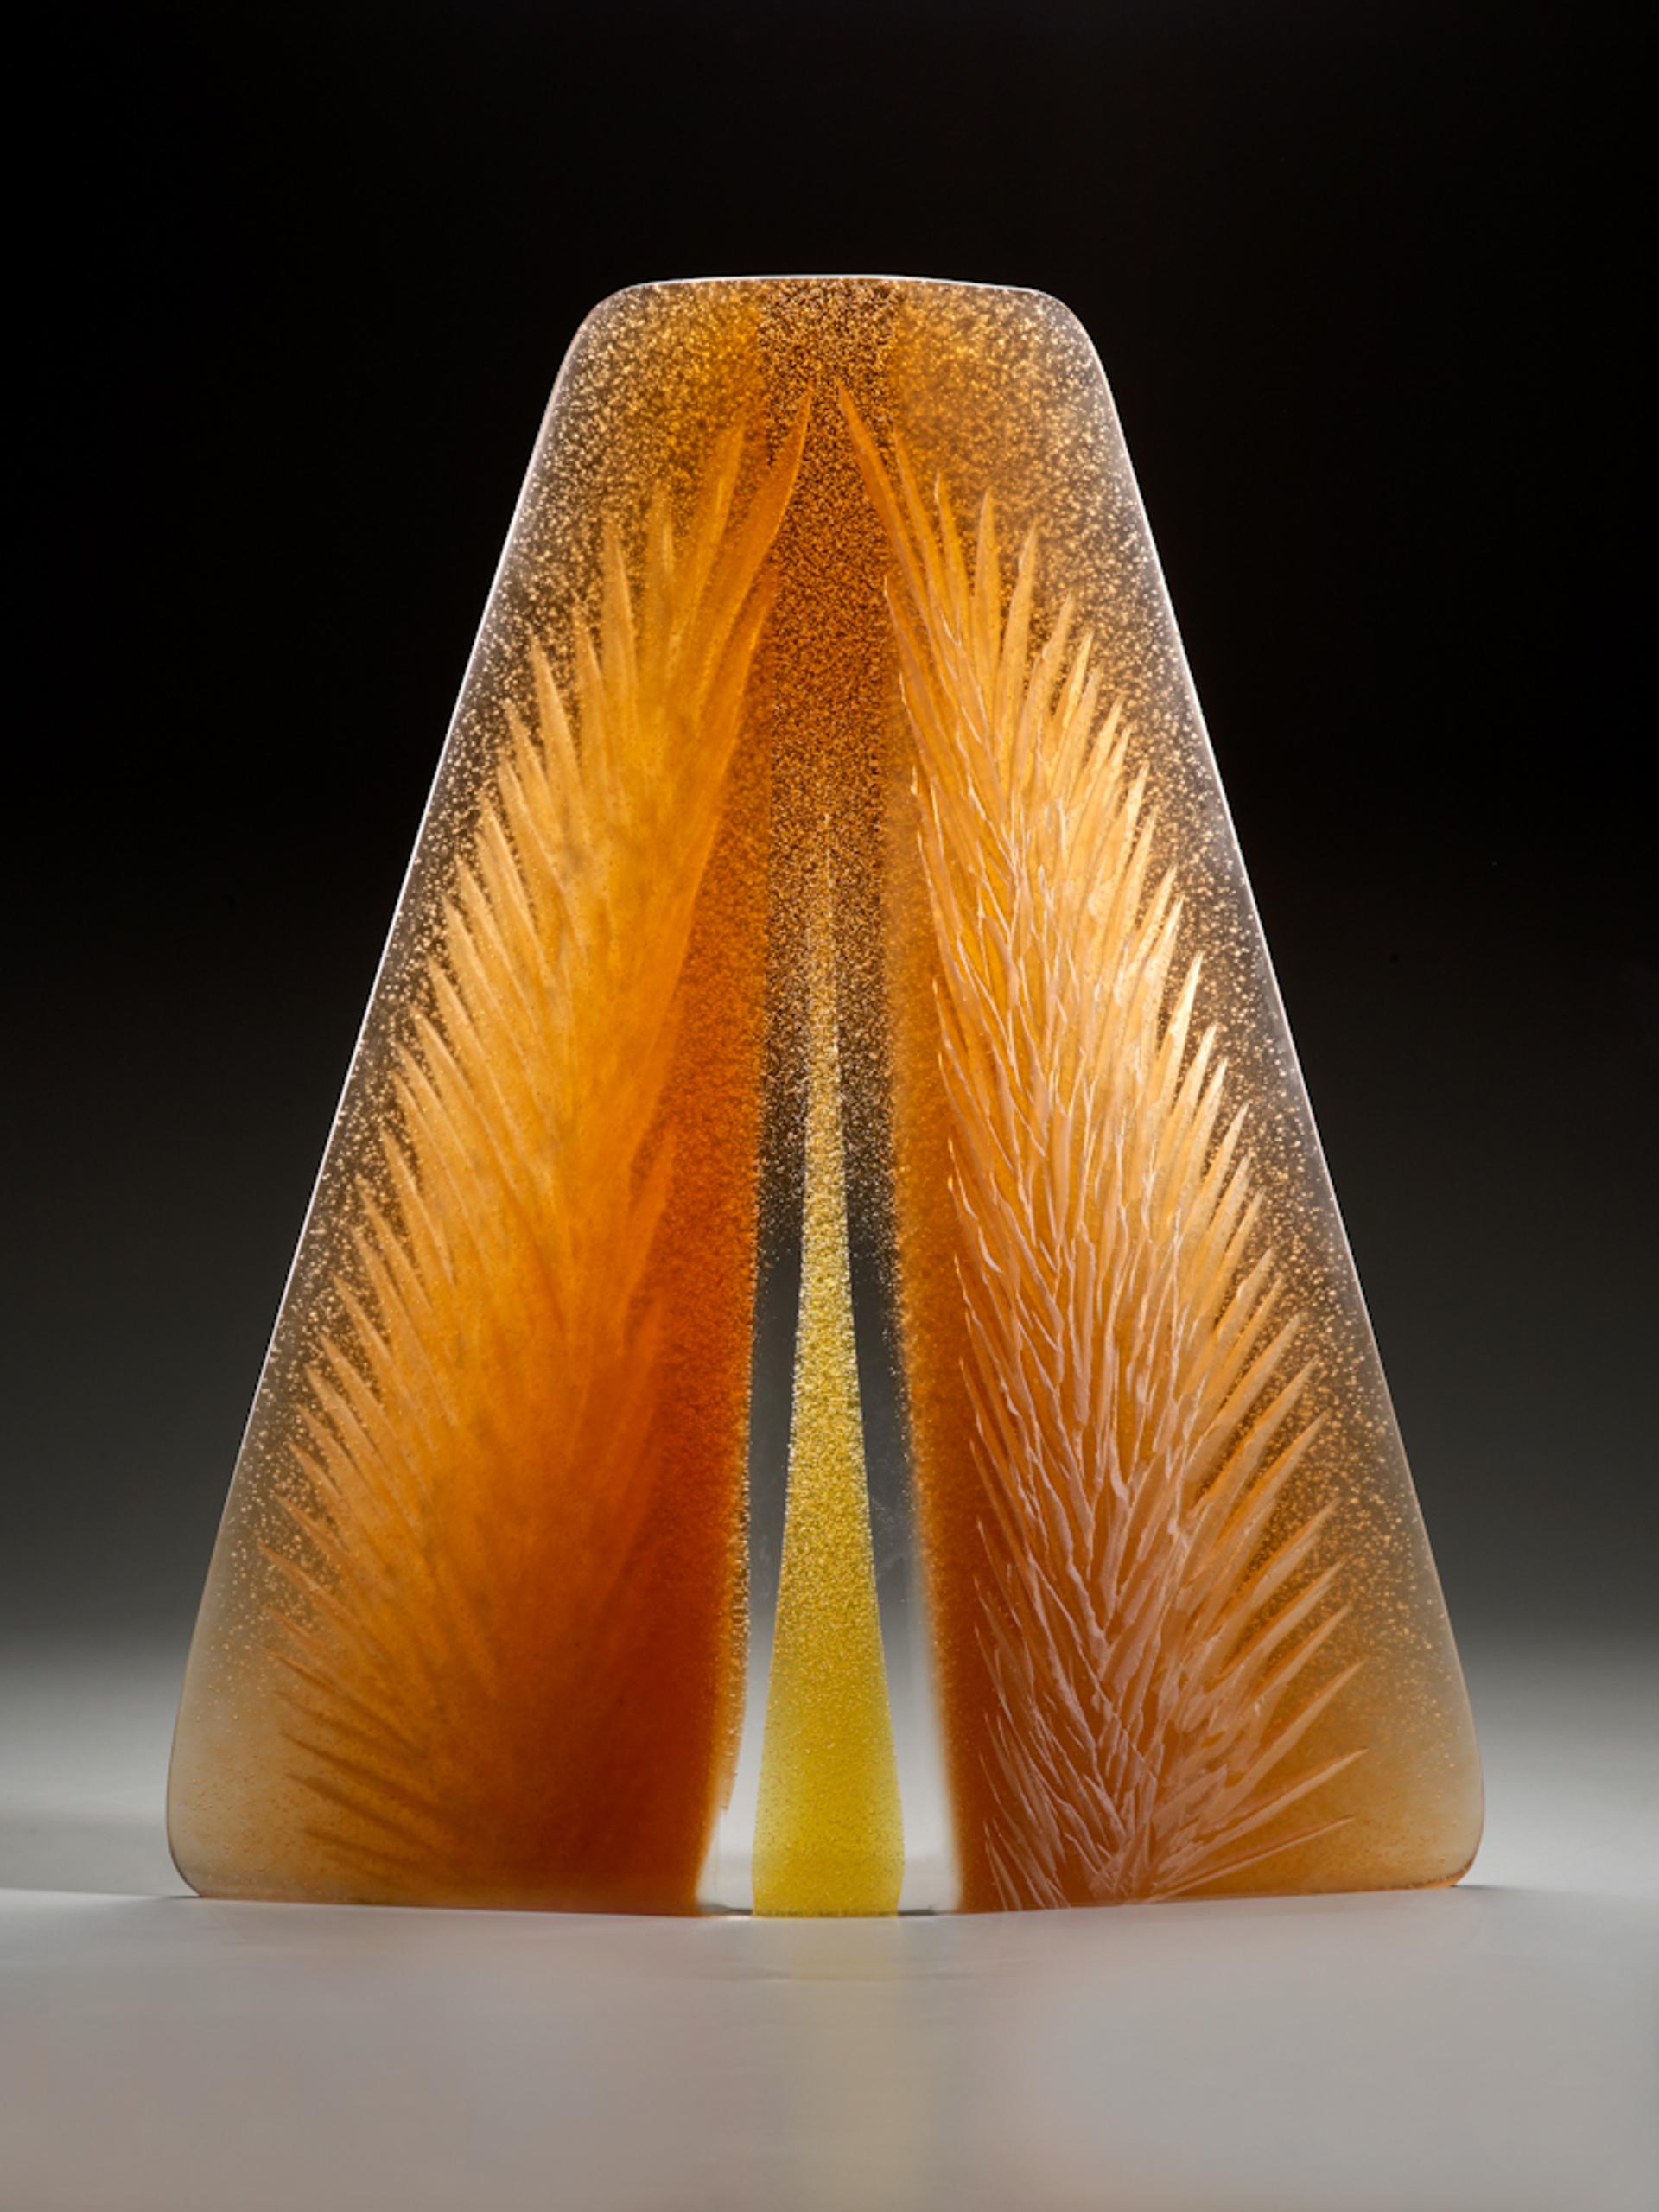 Large Amber Spring by Alex Gabriel Bernstein (b. 1972)